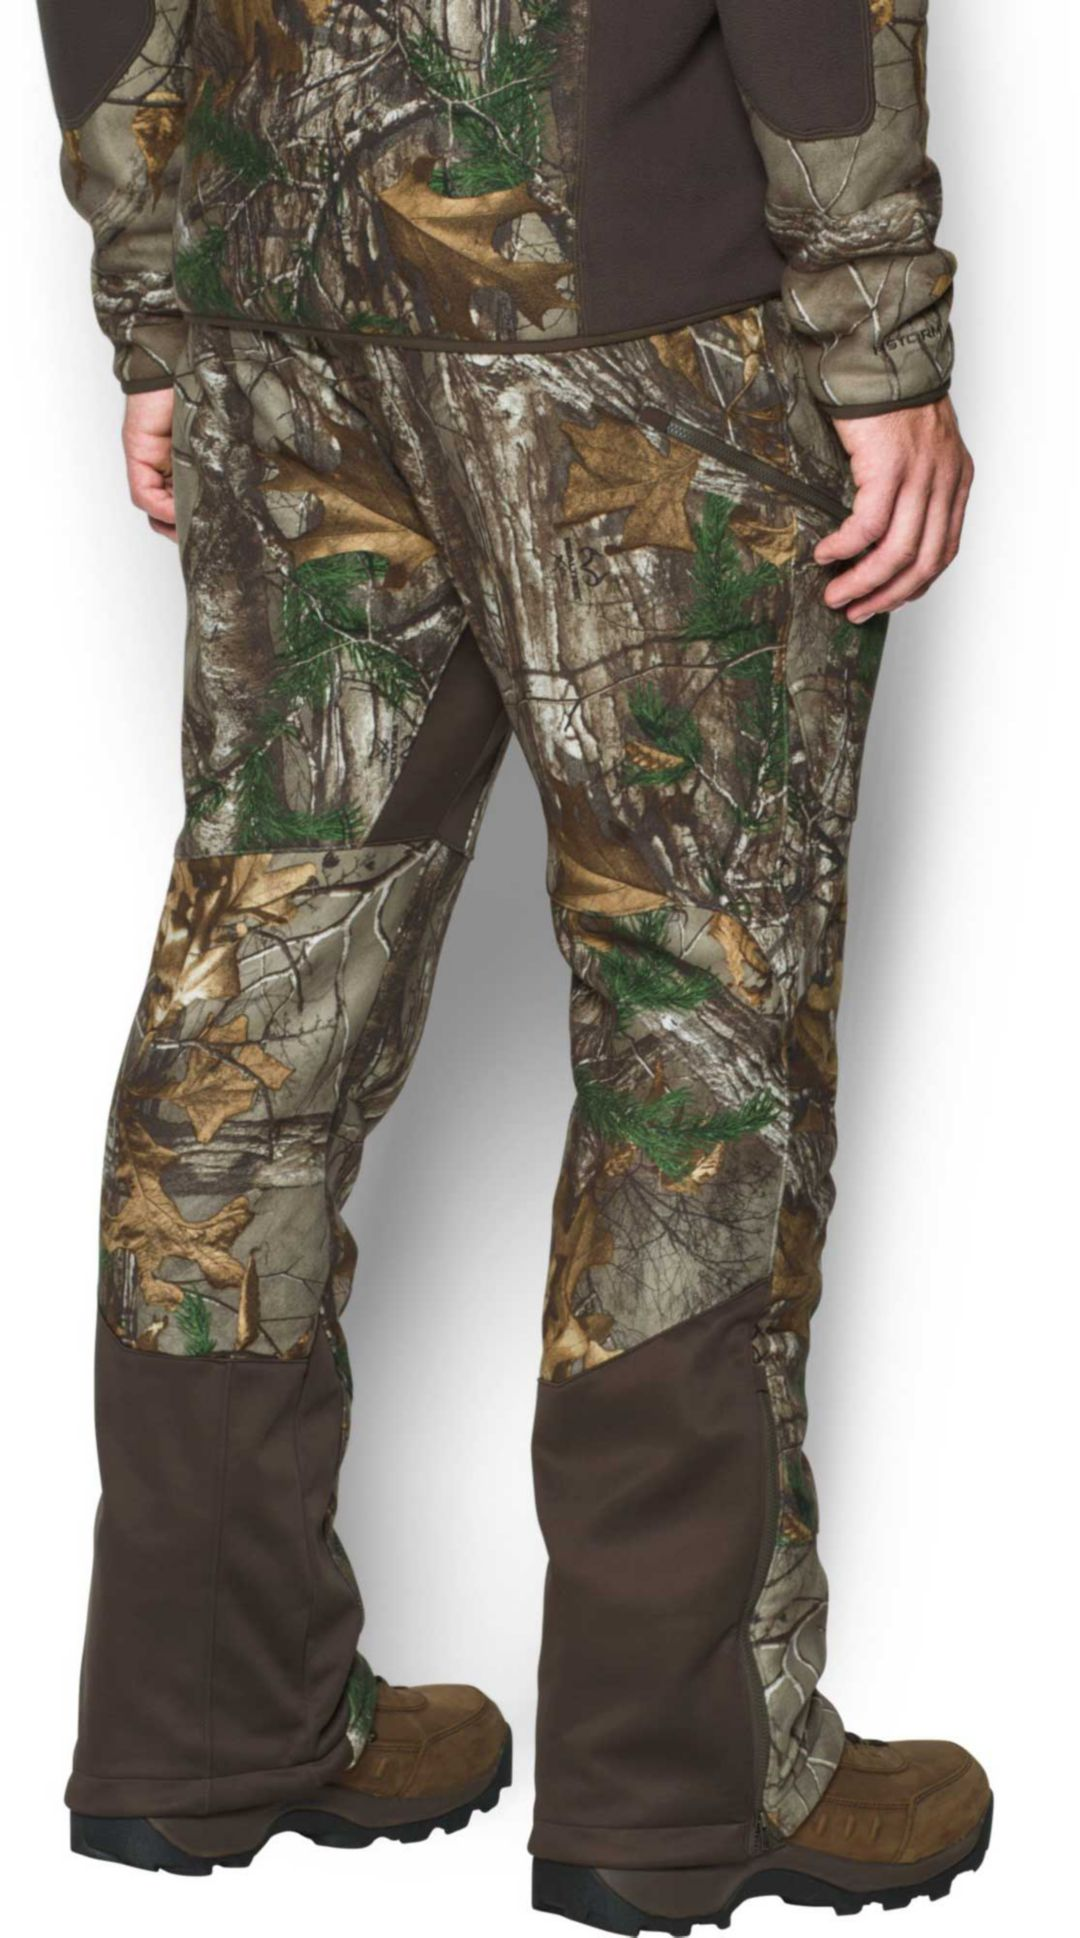 c337f0a4add4b Under Armour Men's Stealth Mid-Season Hunting Pants   Field & Stream